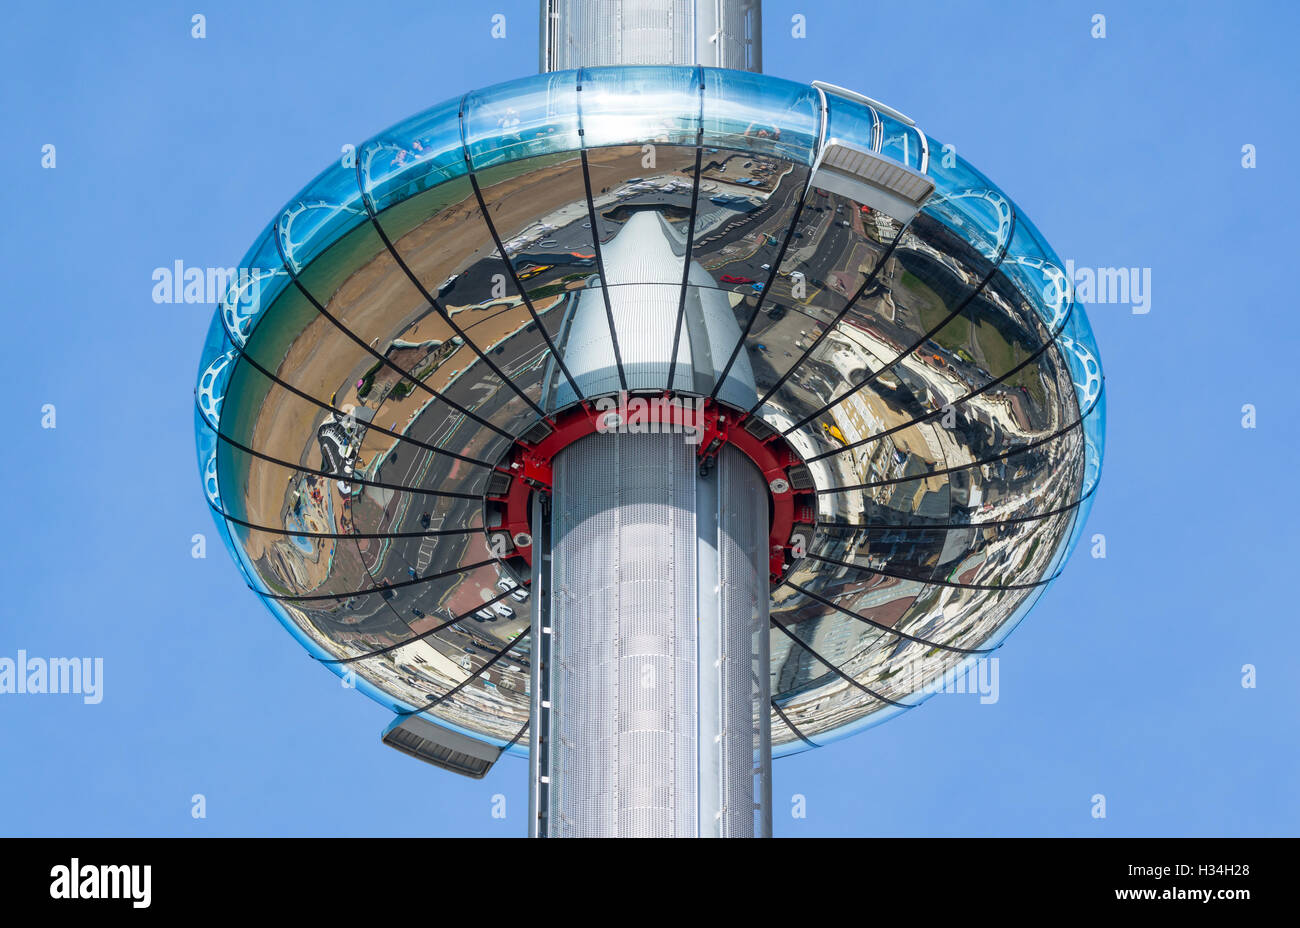 i360. British Airways i360 Observation Tower in Brighton, East Sussex, England, UK. i360 Brighton i360. i360 tower. - Stock Image